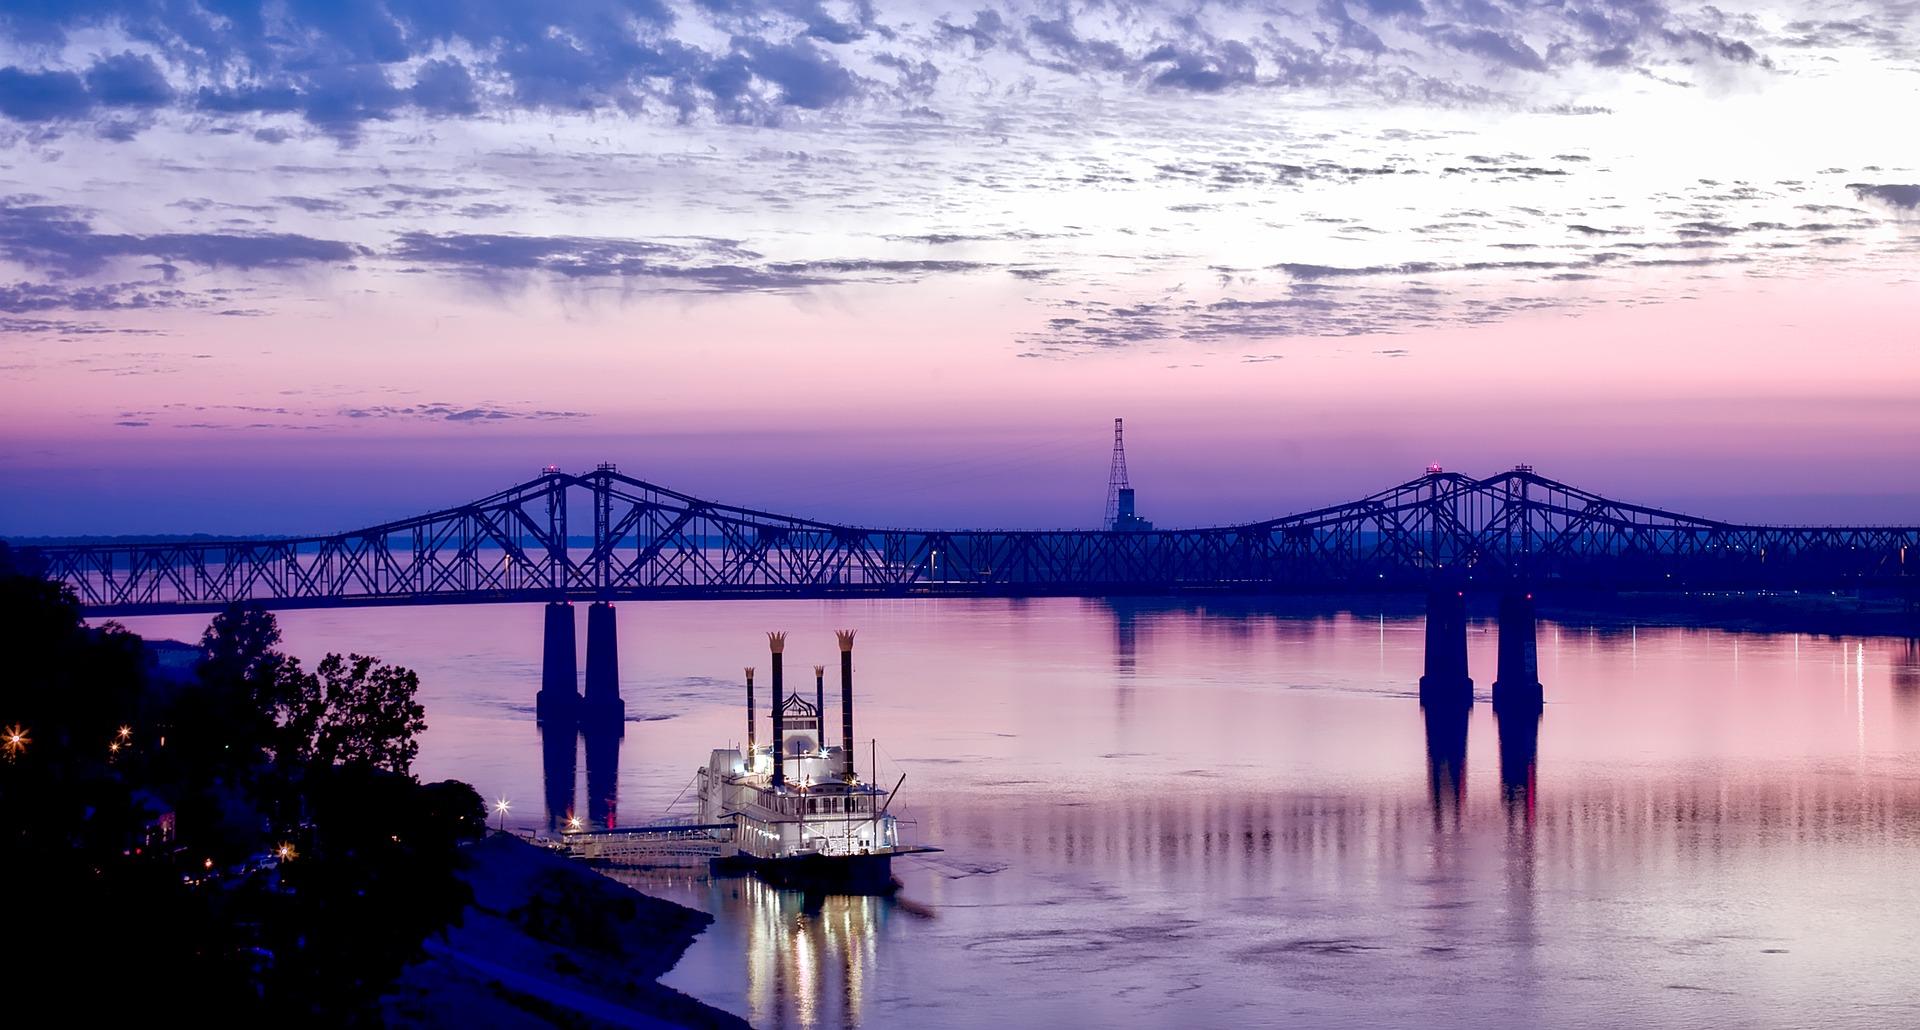 Bridge in Natchez, Mississippi at sunset